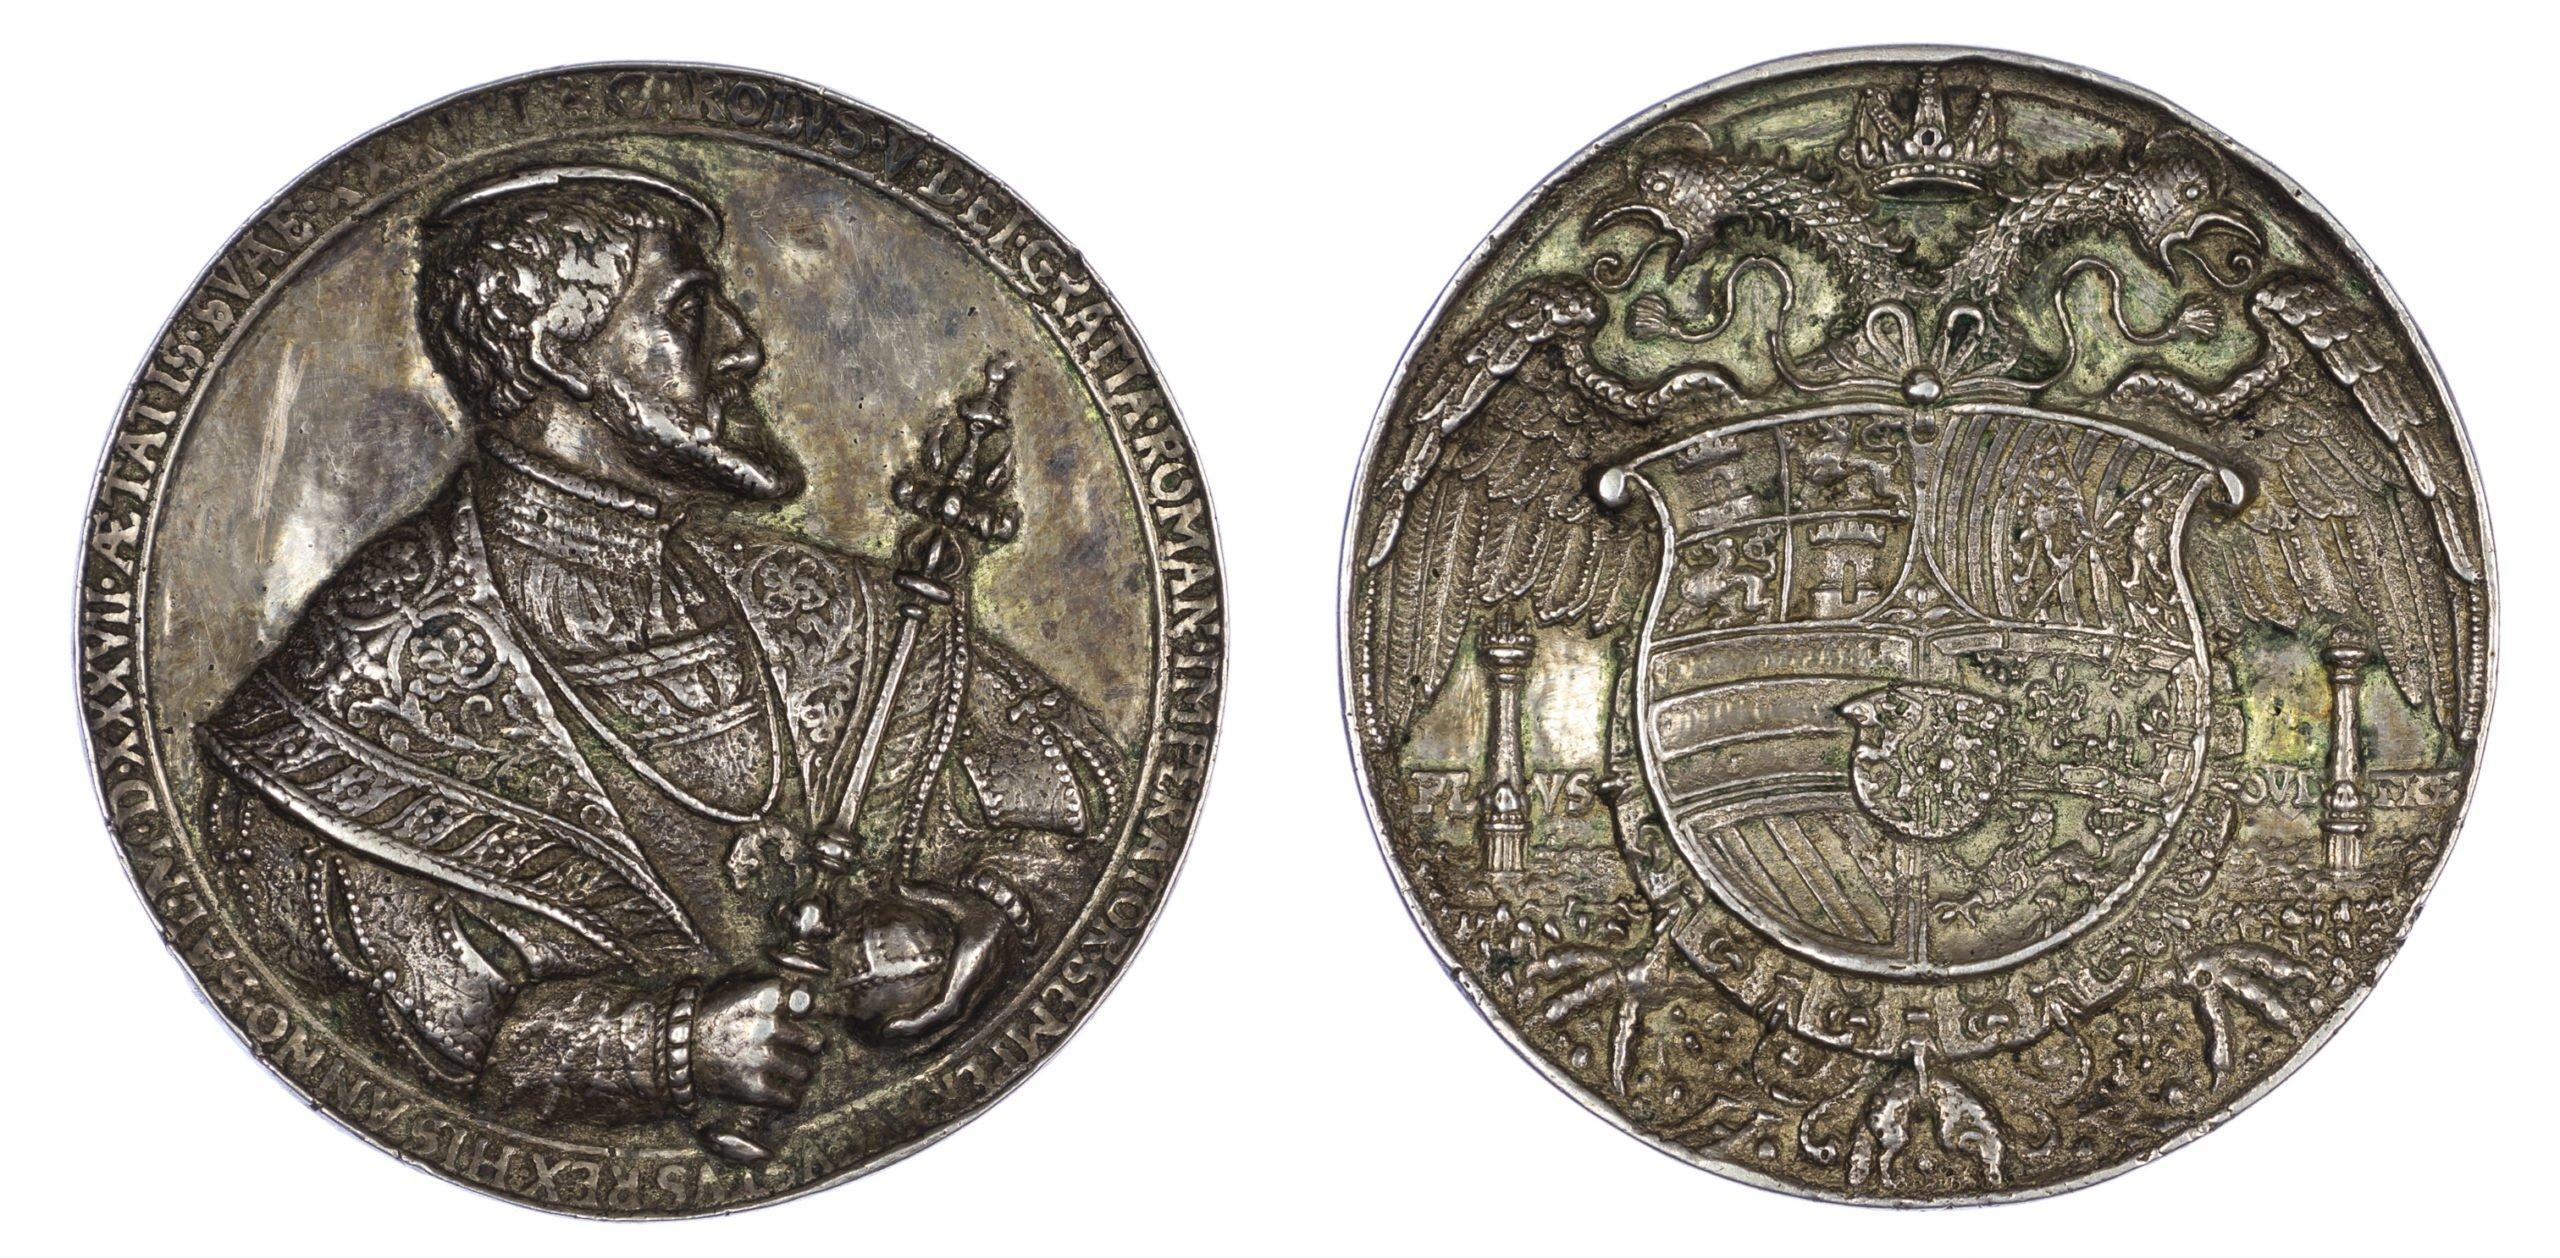 Holy Roman Empire, Charles V, silver medal, 1537